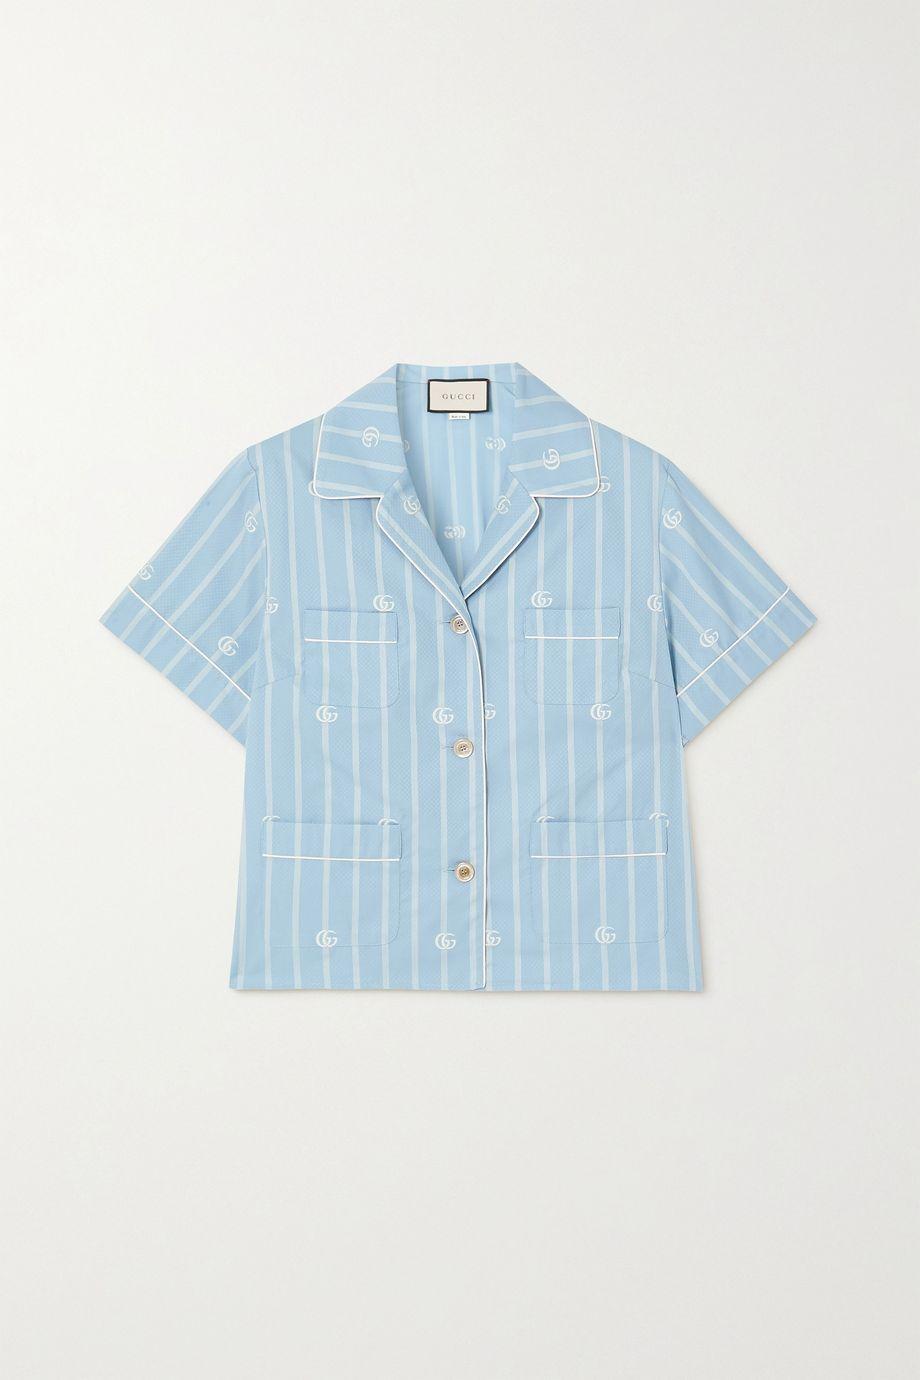 Gucci Striped cotton-jacquard shirt